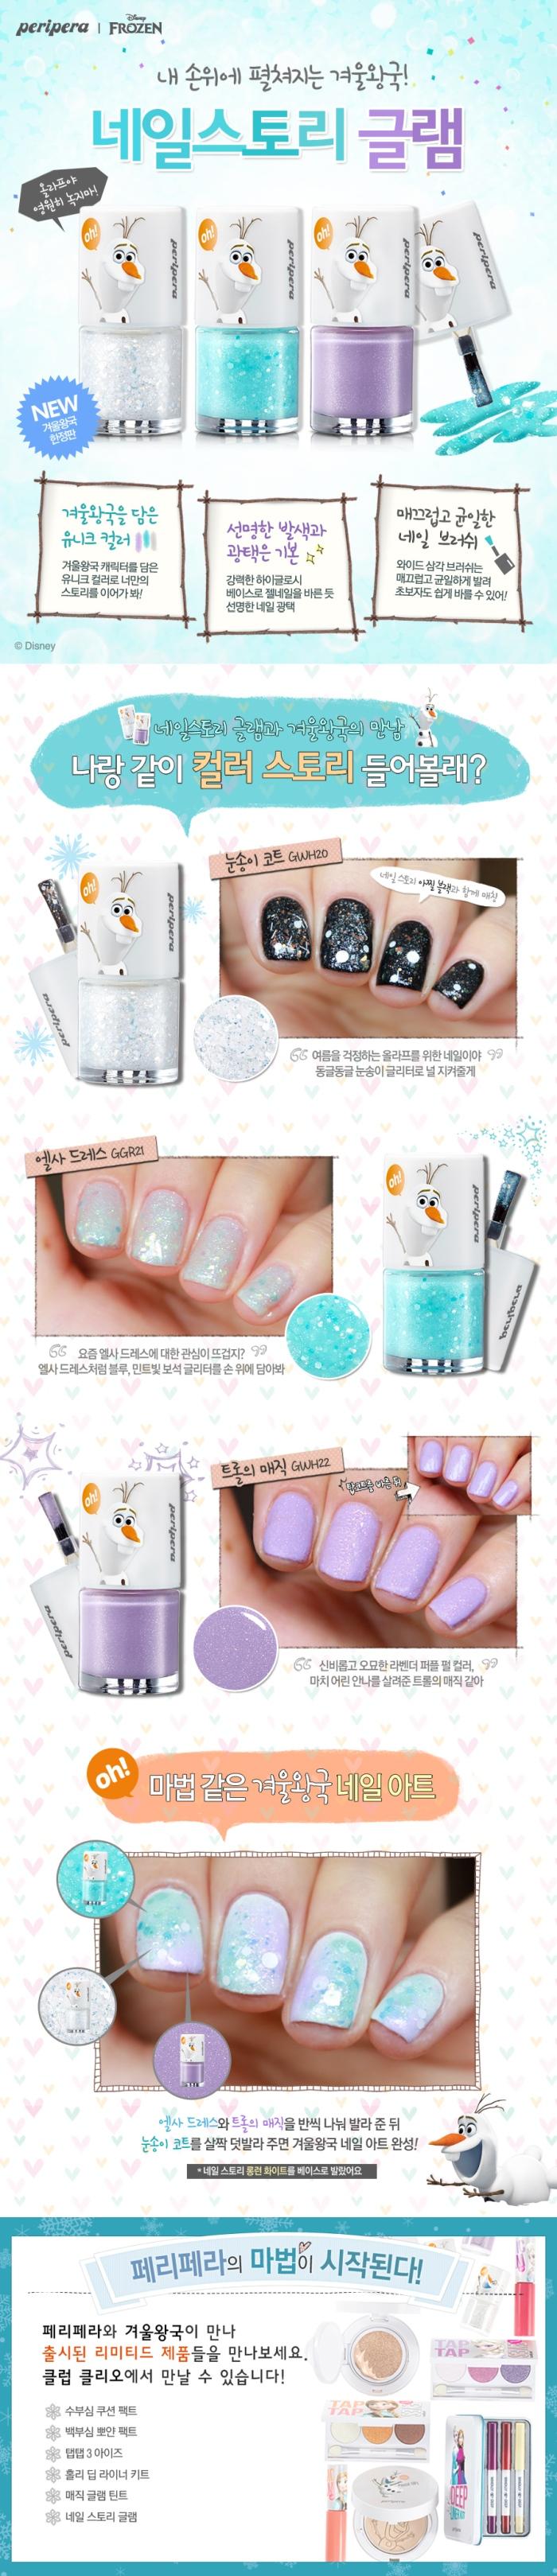 frozen_nail_story_900